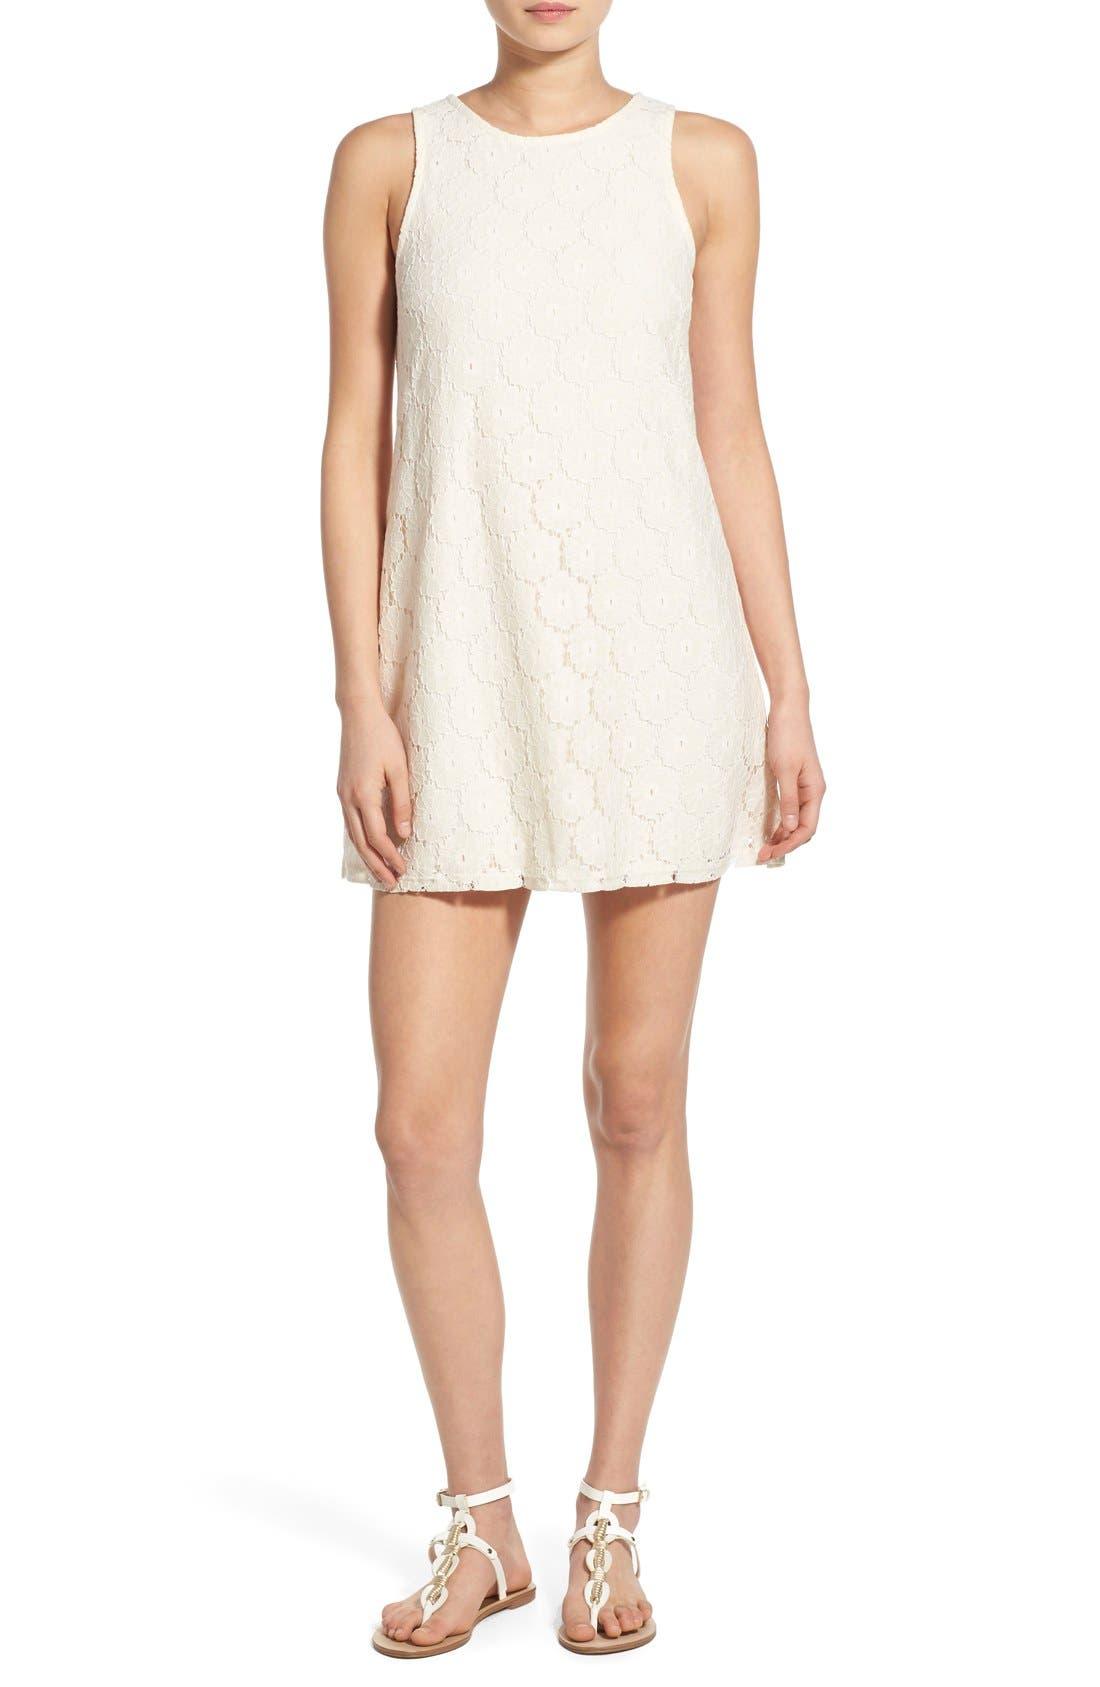 Alternate Image 1 Selected - Speechless 'Daisy' Lace Sleeveless Shift Dress